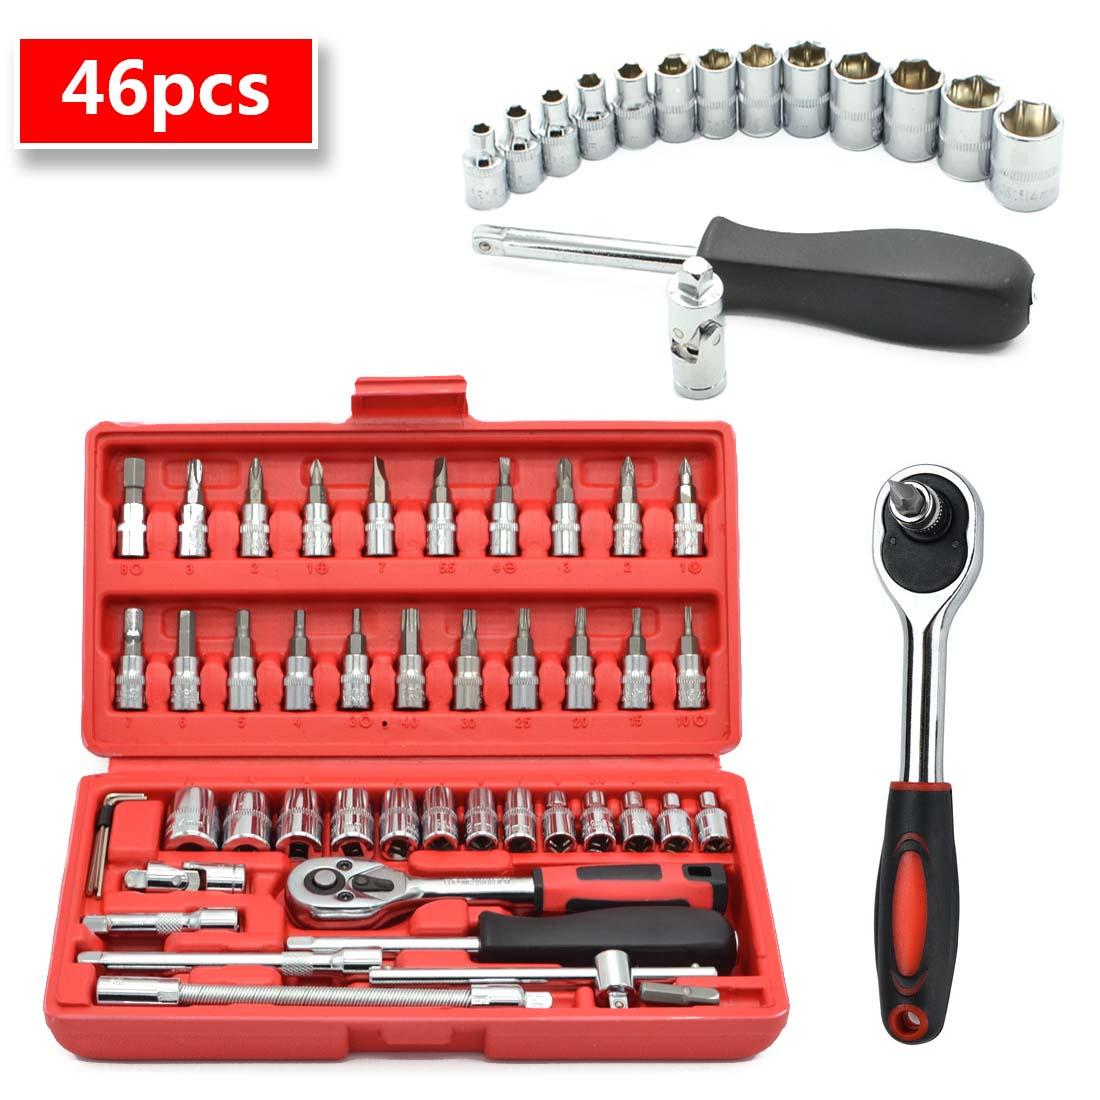 1/4-Inch Socket Set Car Repair Tool Ratchet Set Torque Wrench Combination Bit Set Of Keys Chrome Vanadium 46pcs/set